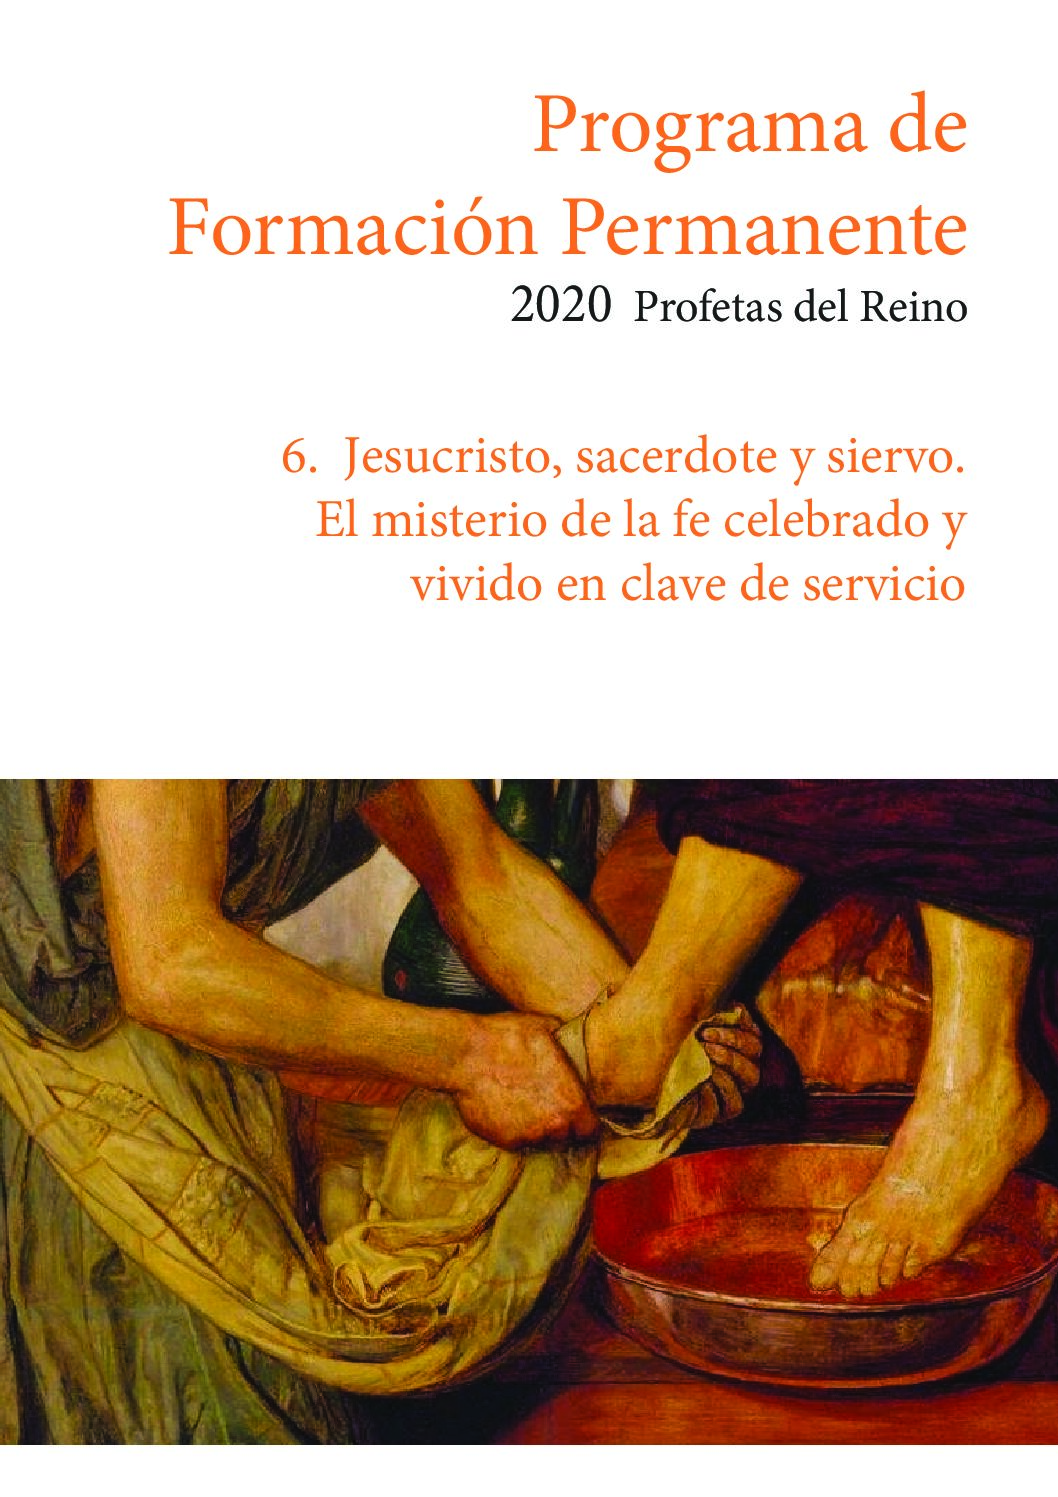 6.-Jesucristo-sacerdote-y-siervo-pdf[1]